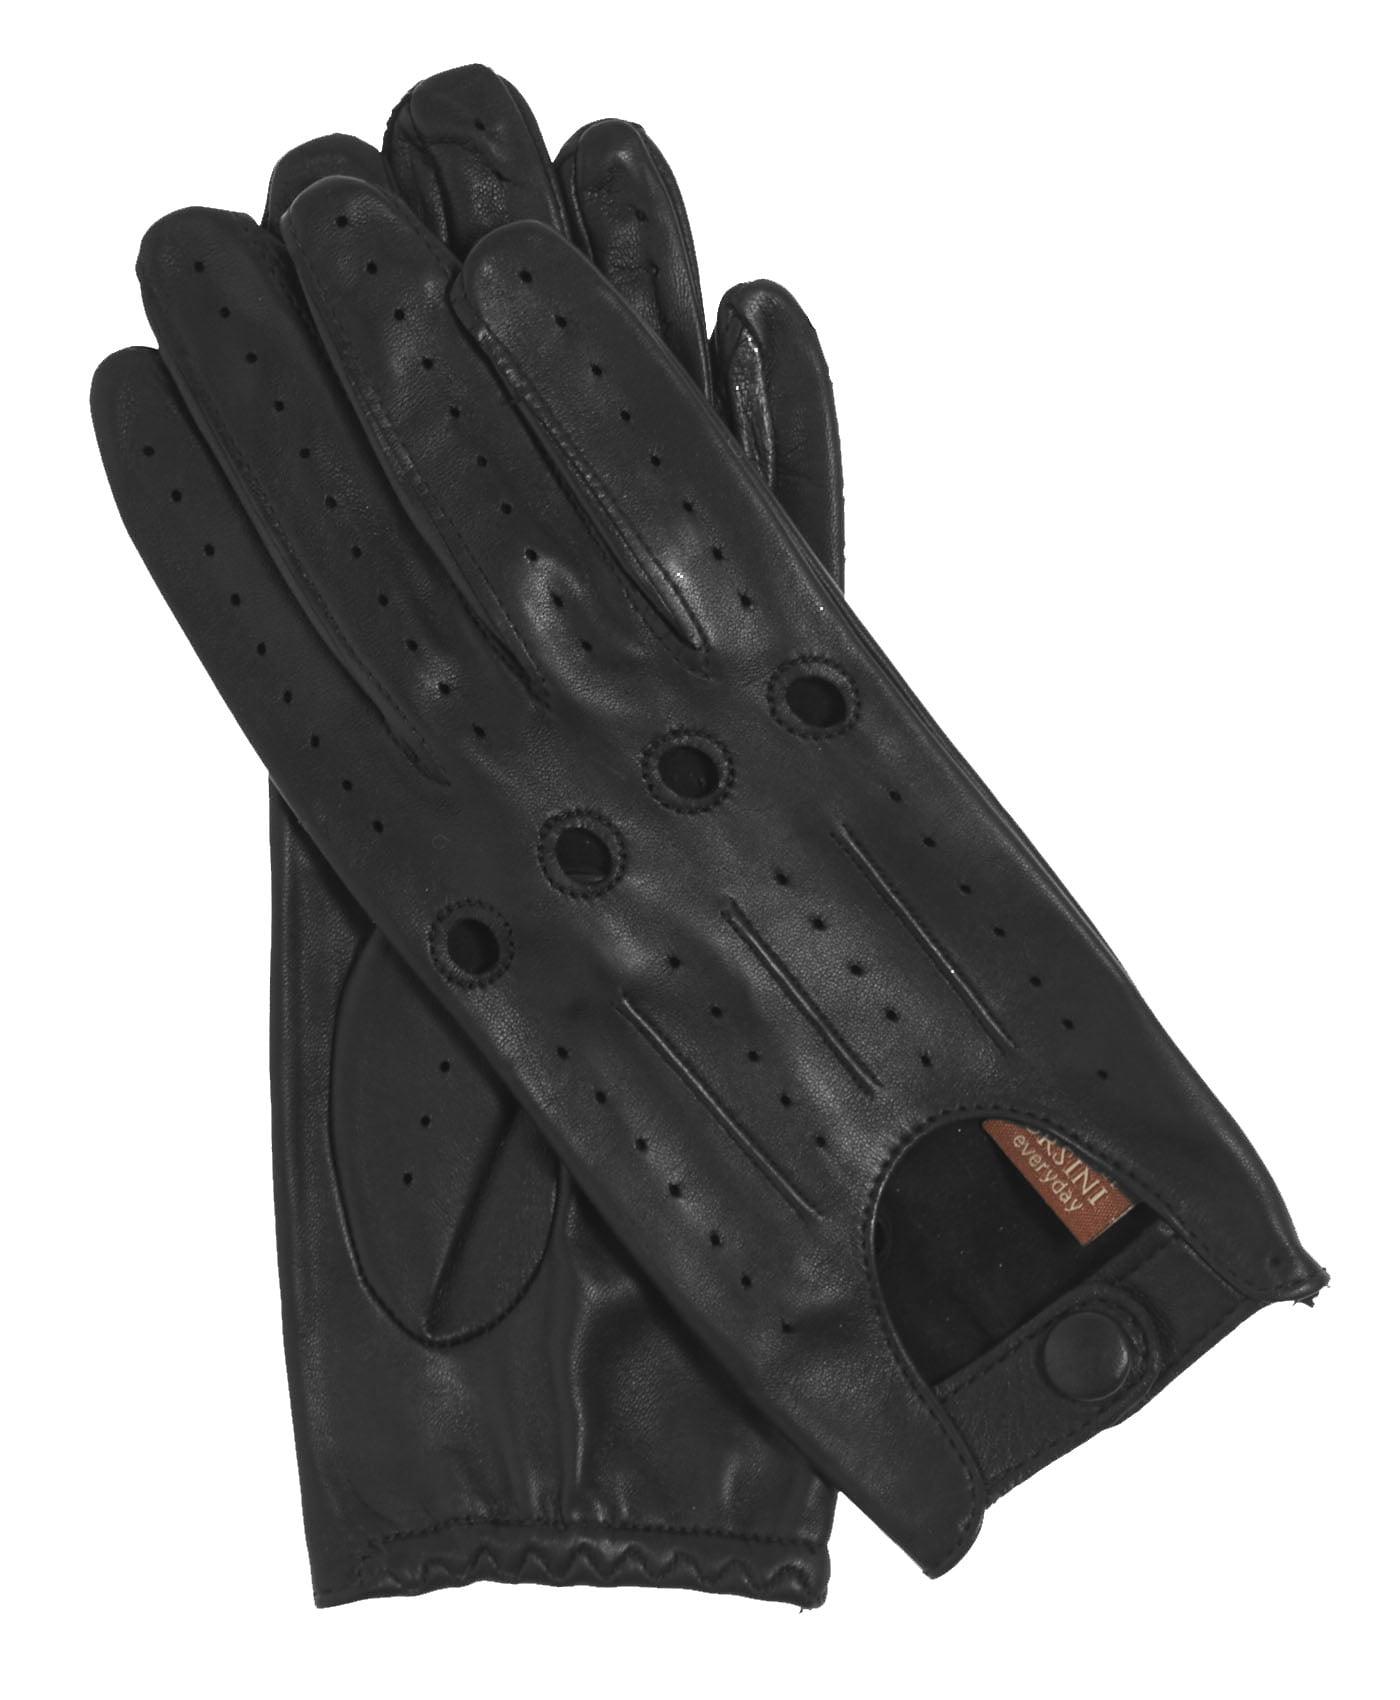 Shorty leather driving gloves fingerless - Fratelli Orsini Everyday Women S Open Back Leather Driving Gloves